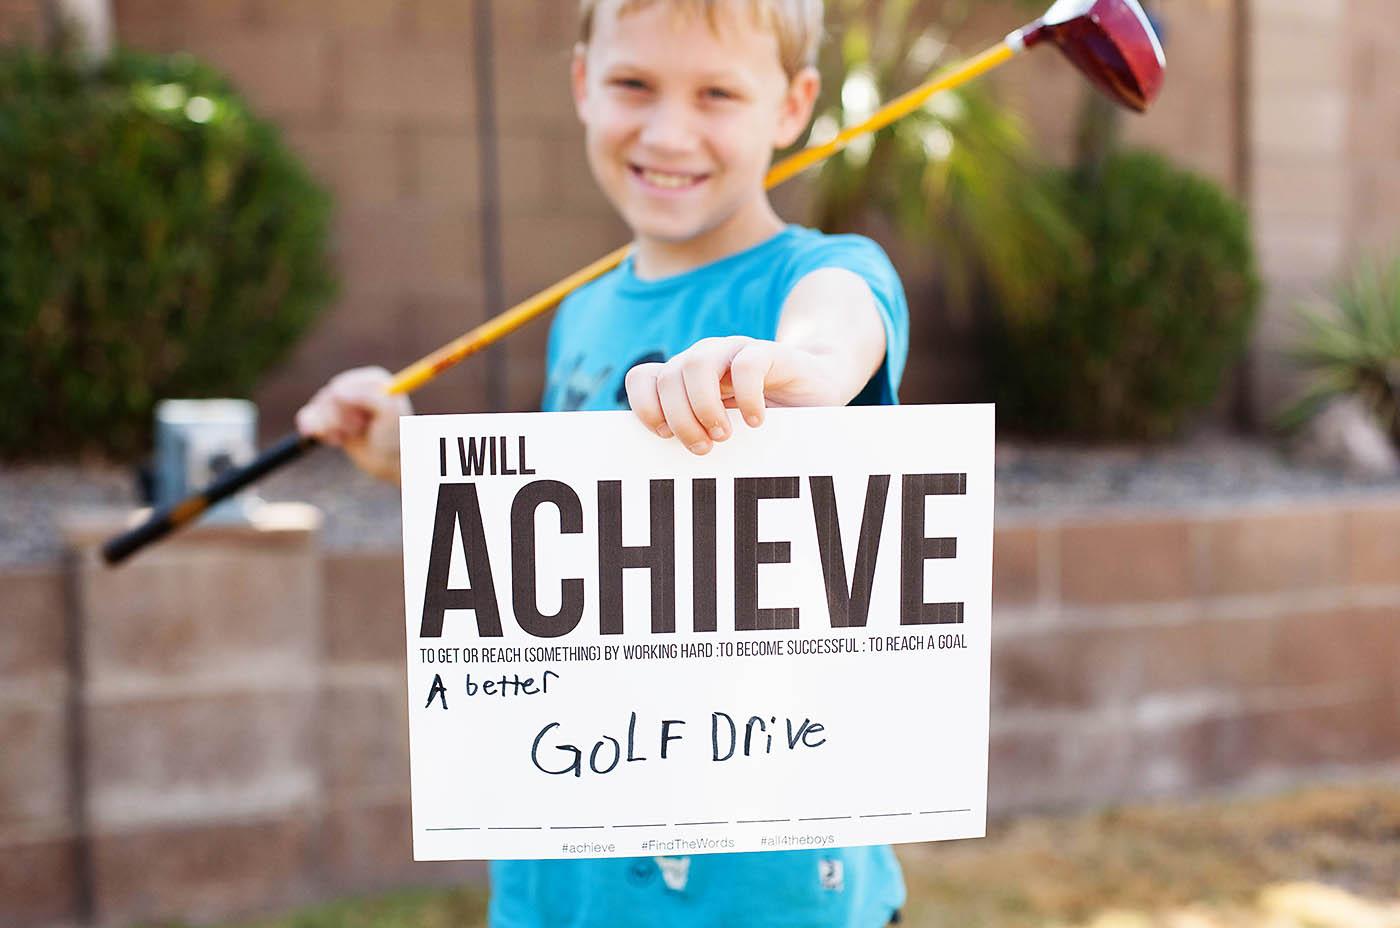 Helping Children ACHIEVE: $100 Amazon GC giveaway